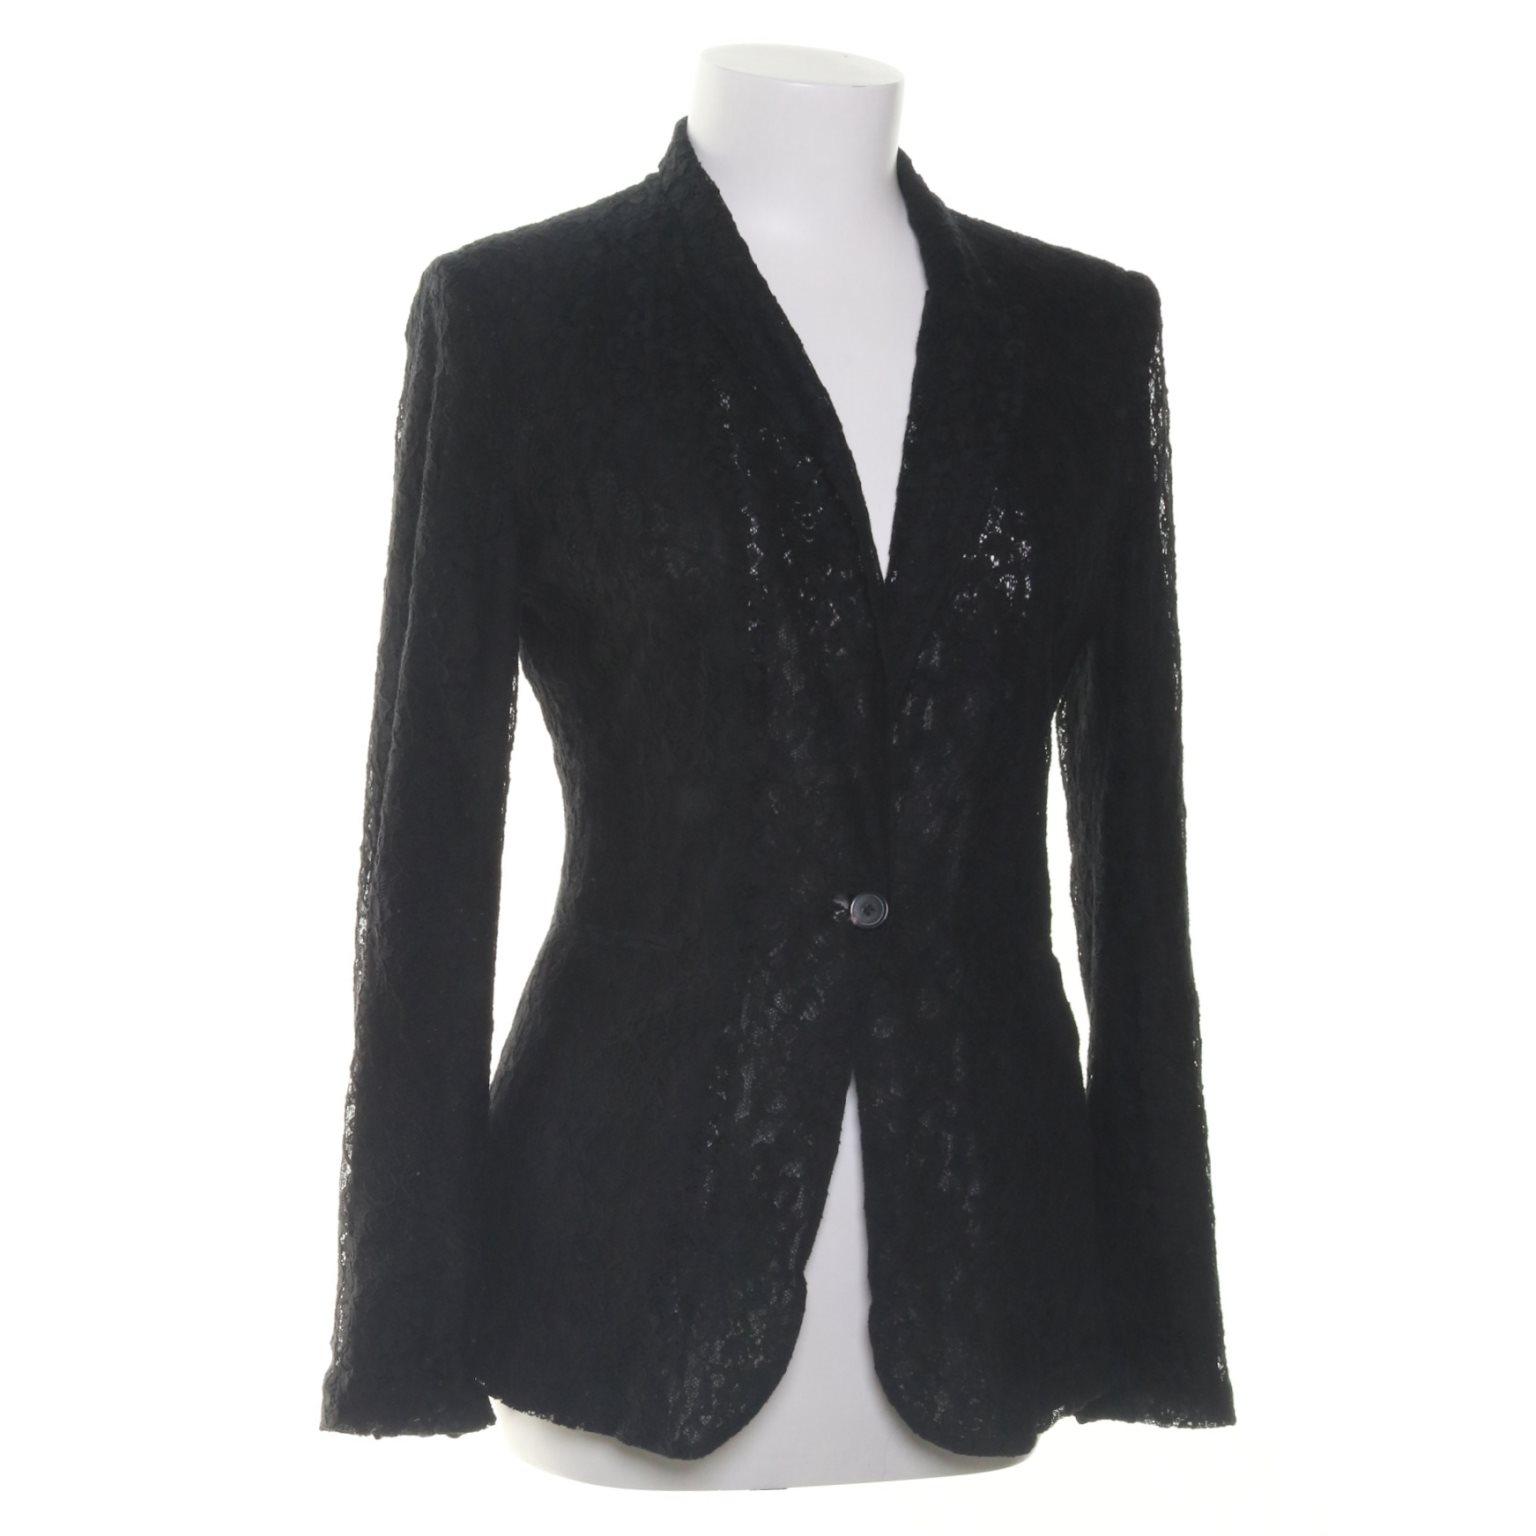 Zara Woman 603337dc013d6